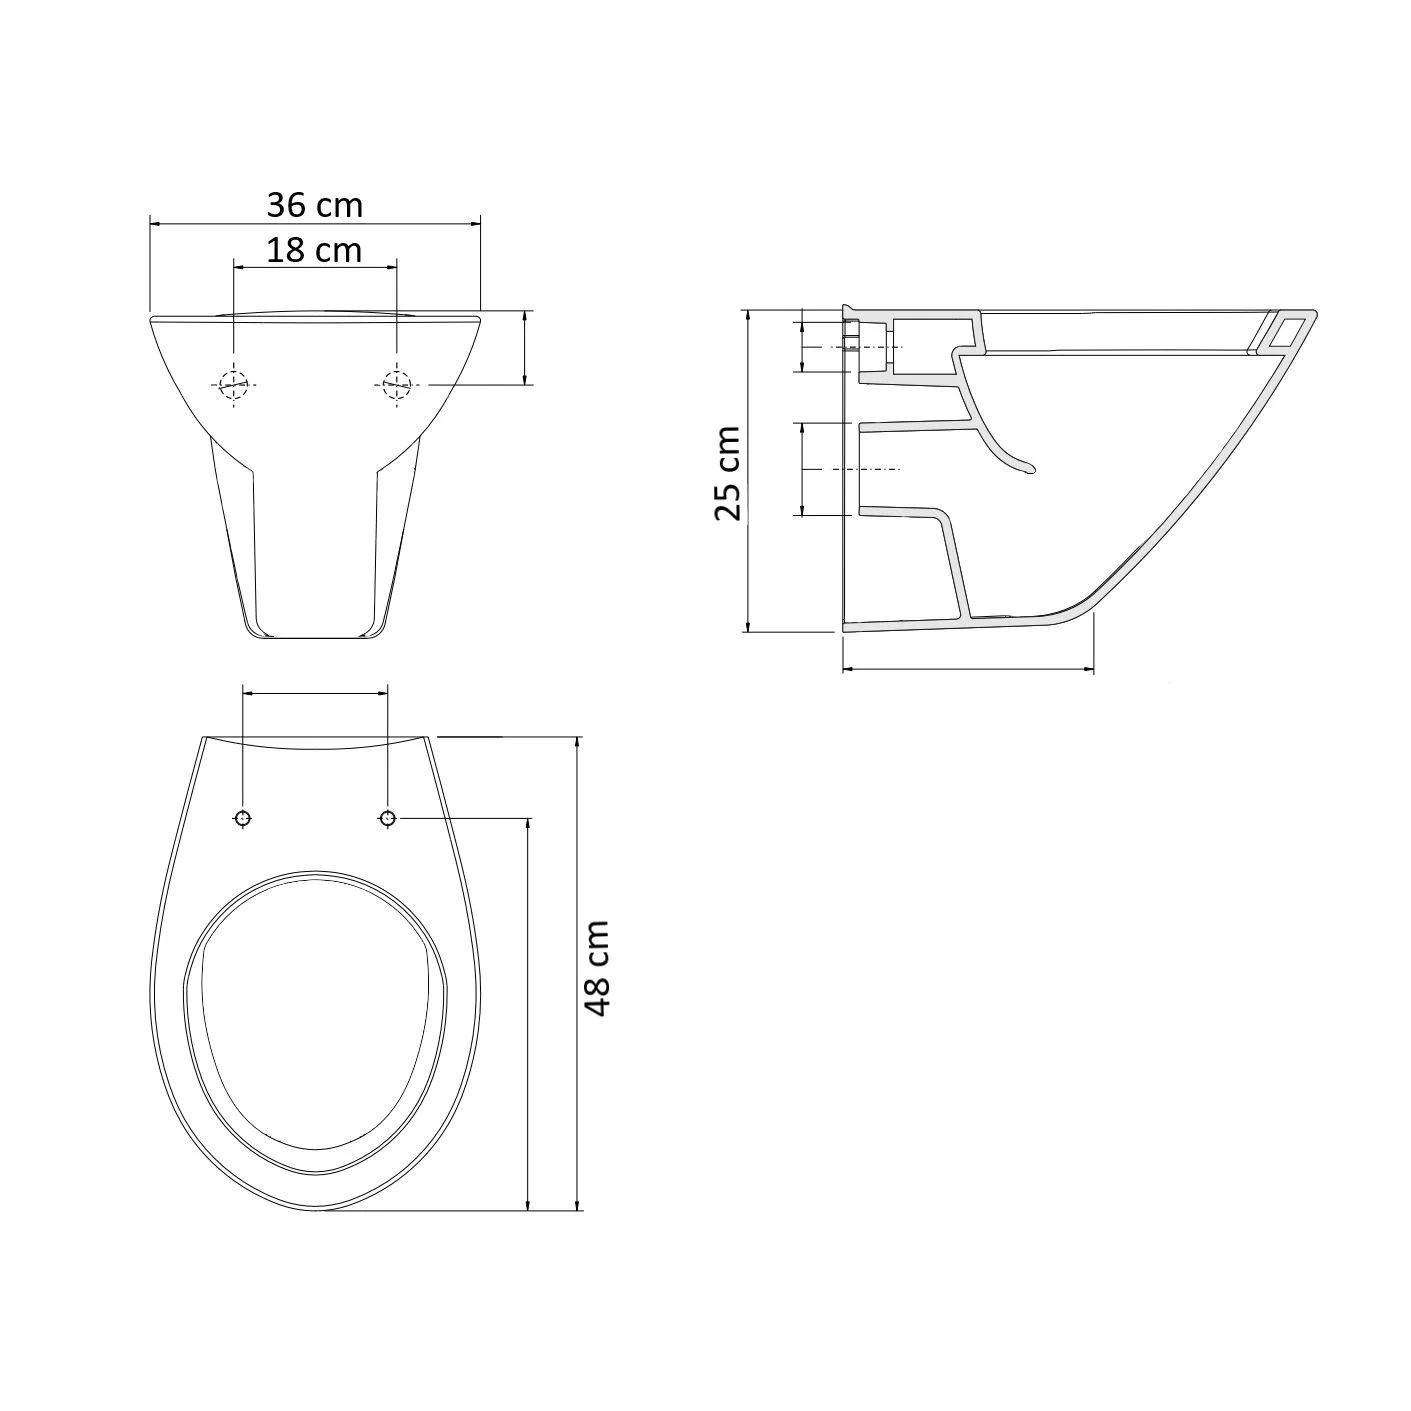 Afmeting Hangend Toilet.Hangtoilet Sanilux Easy Flush Compact Randloos 48cm Incl Zitting